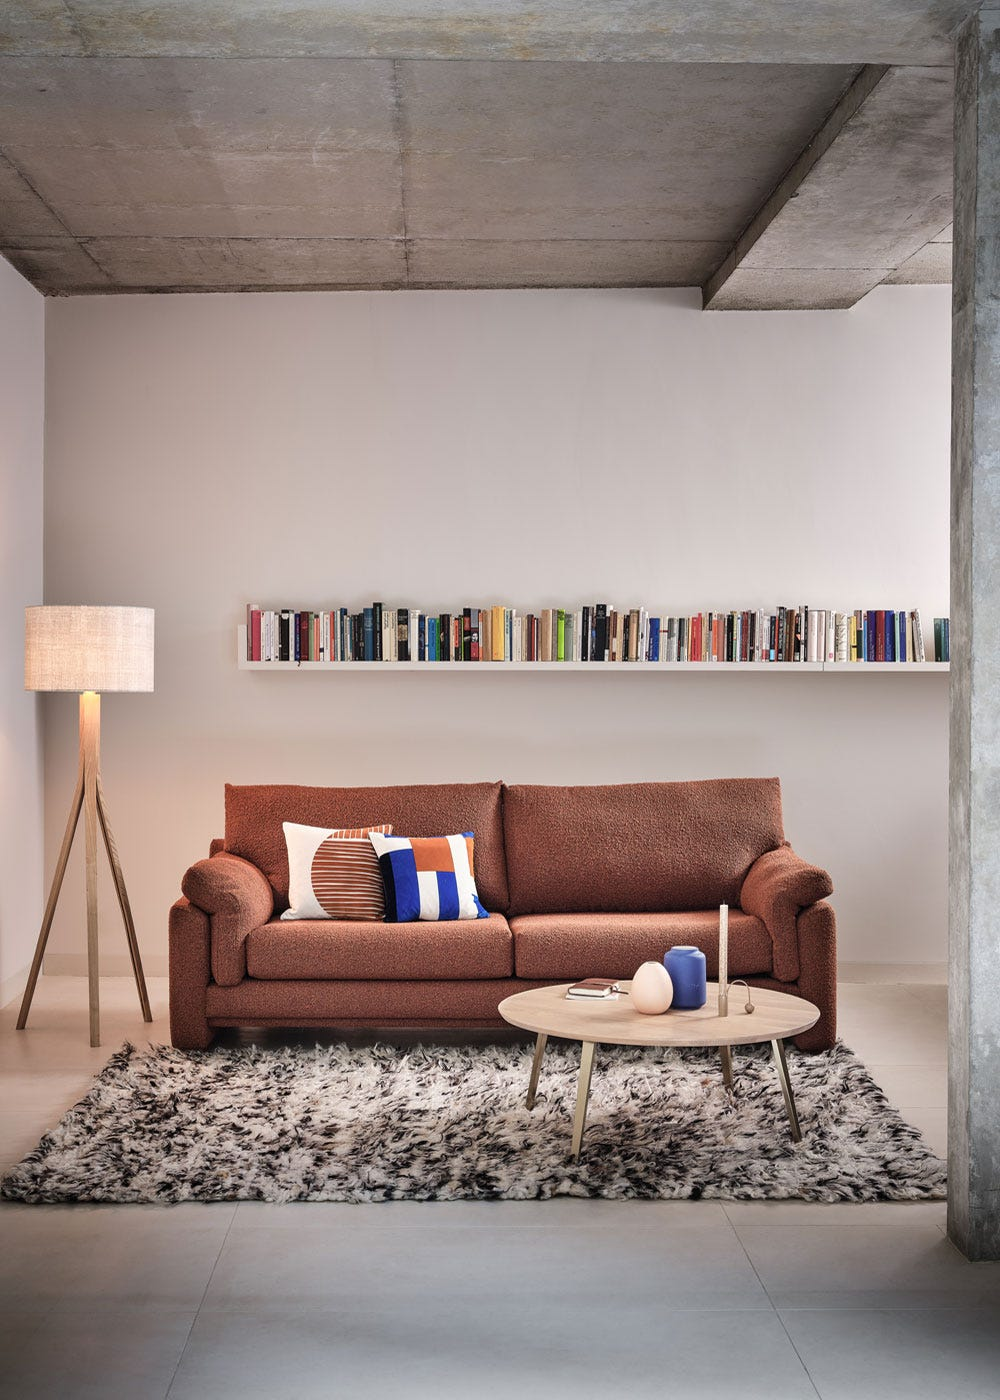 As shown: Crawford coffee table, Paris sofa, Baxter floor lamp.